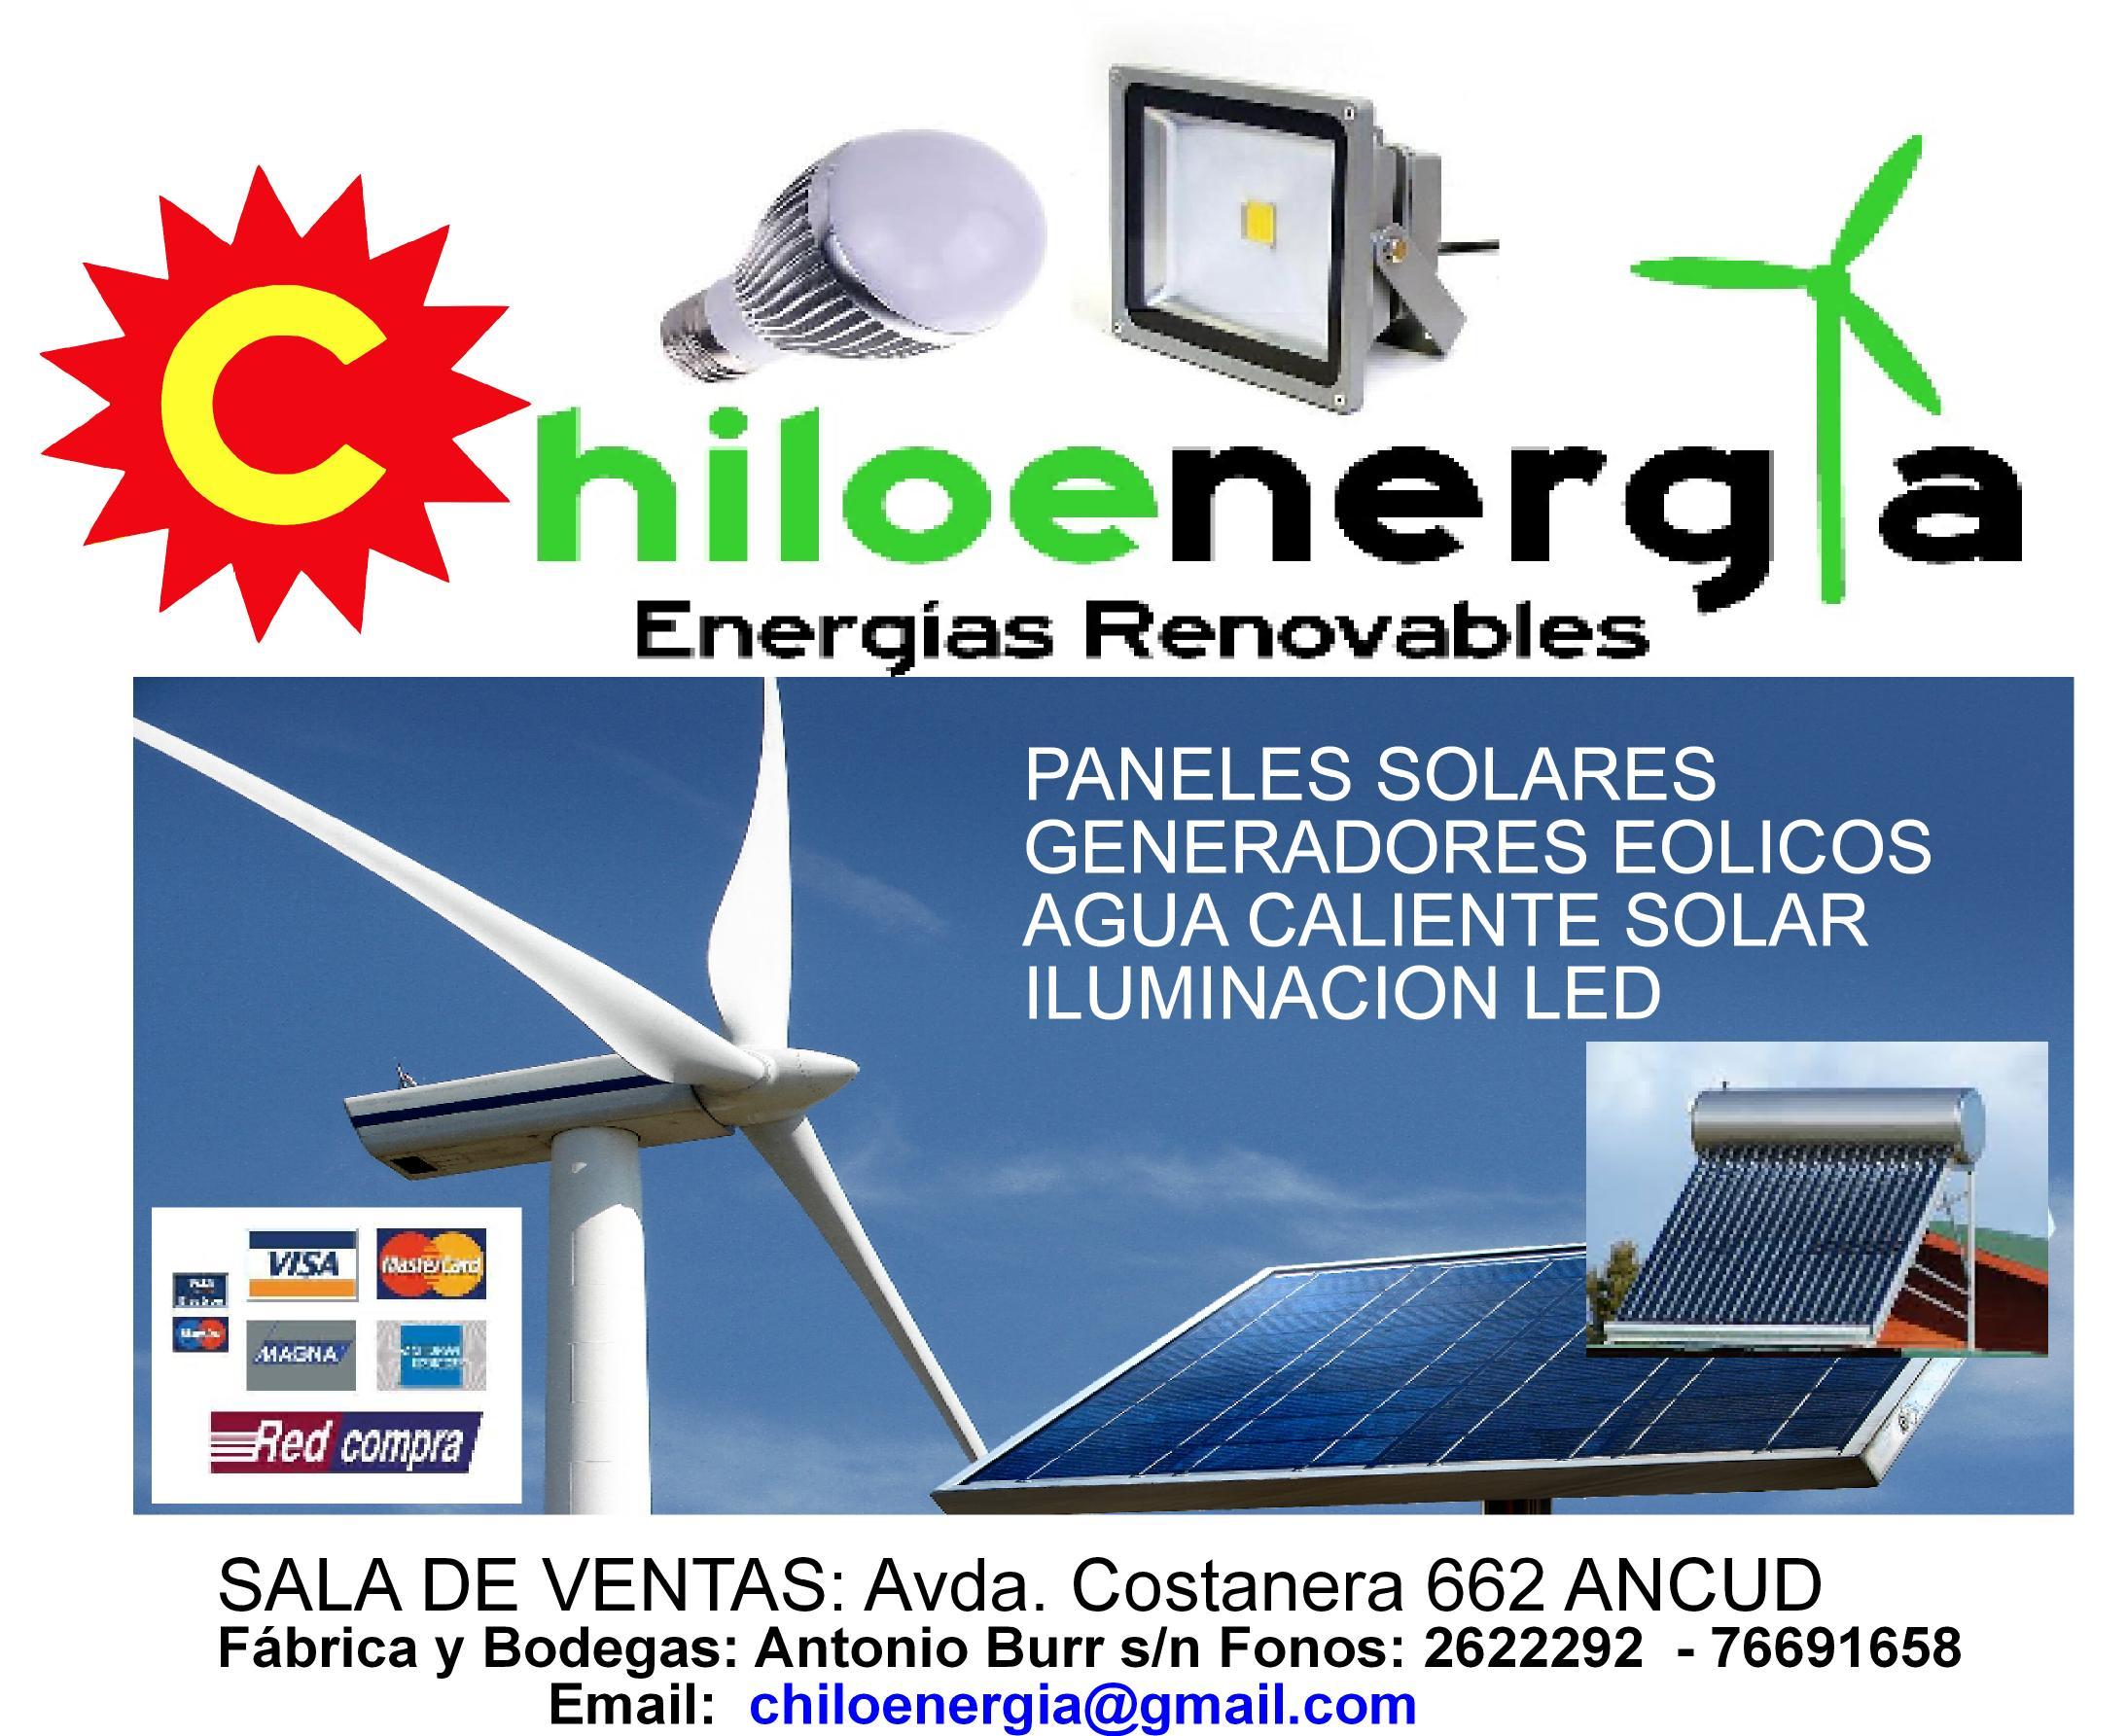 Chiloenergia